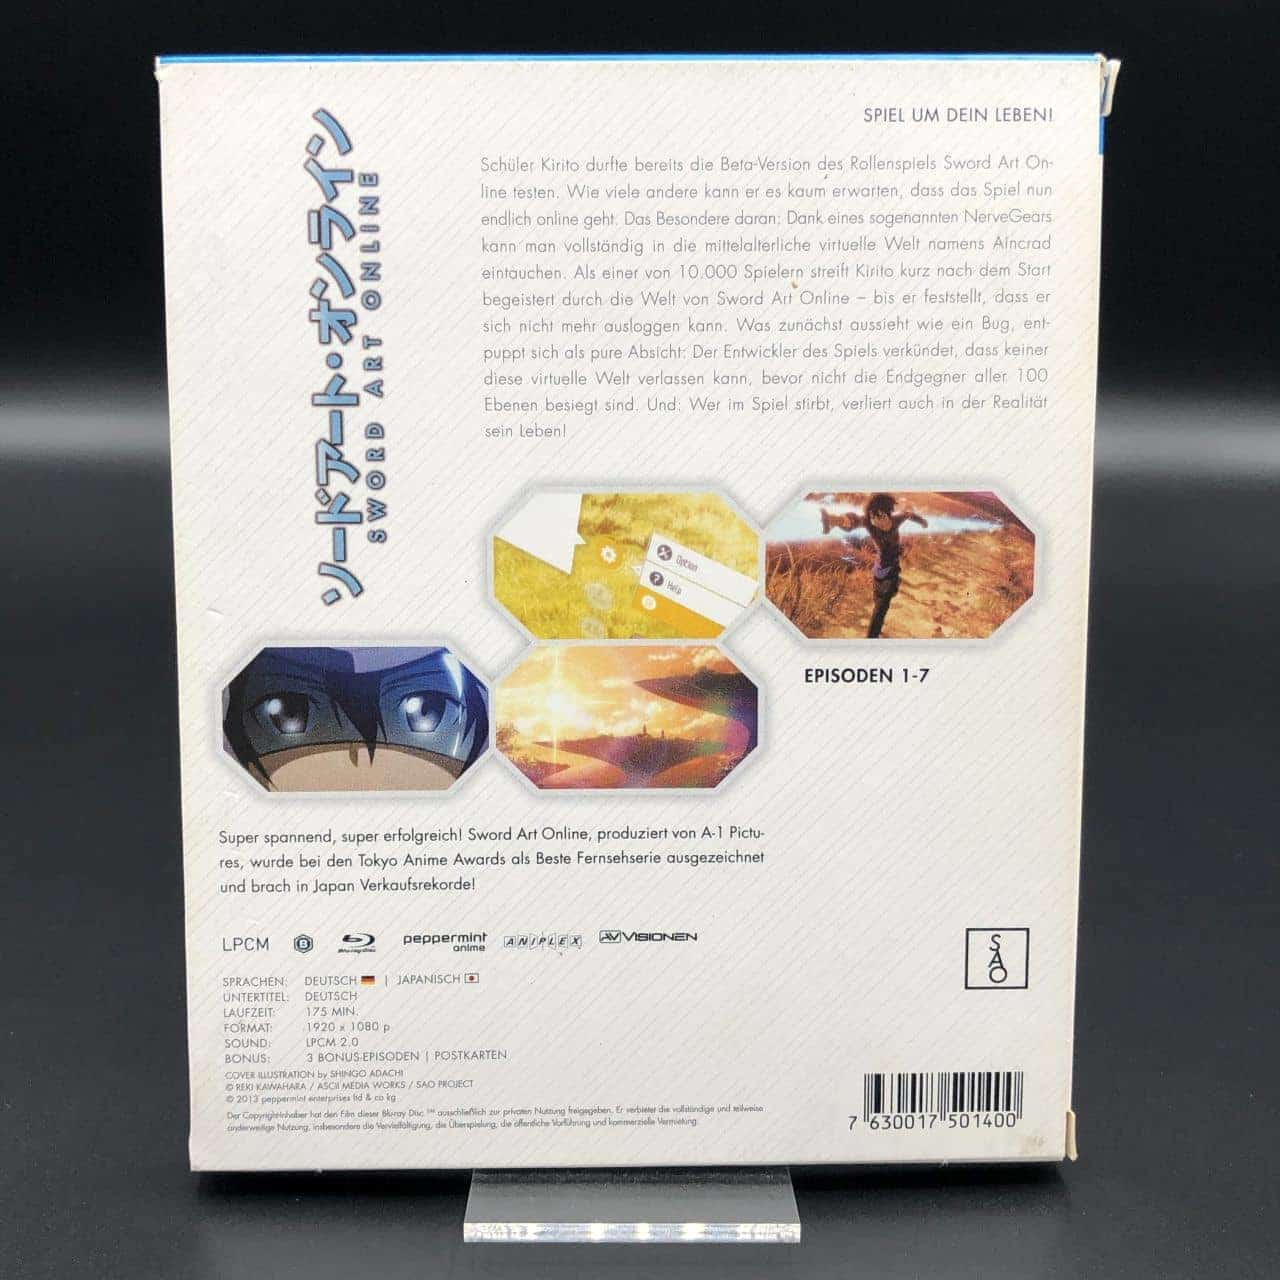 Sword Art Online Vol. 1 (Blu-Ray) (Sehr gut) Anime